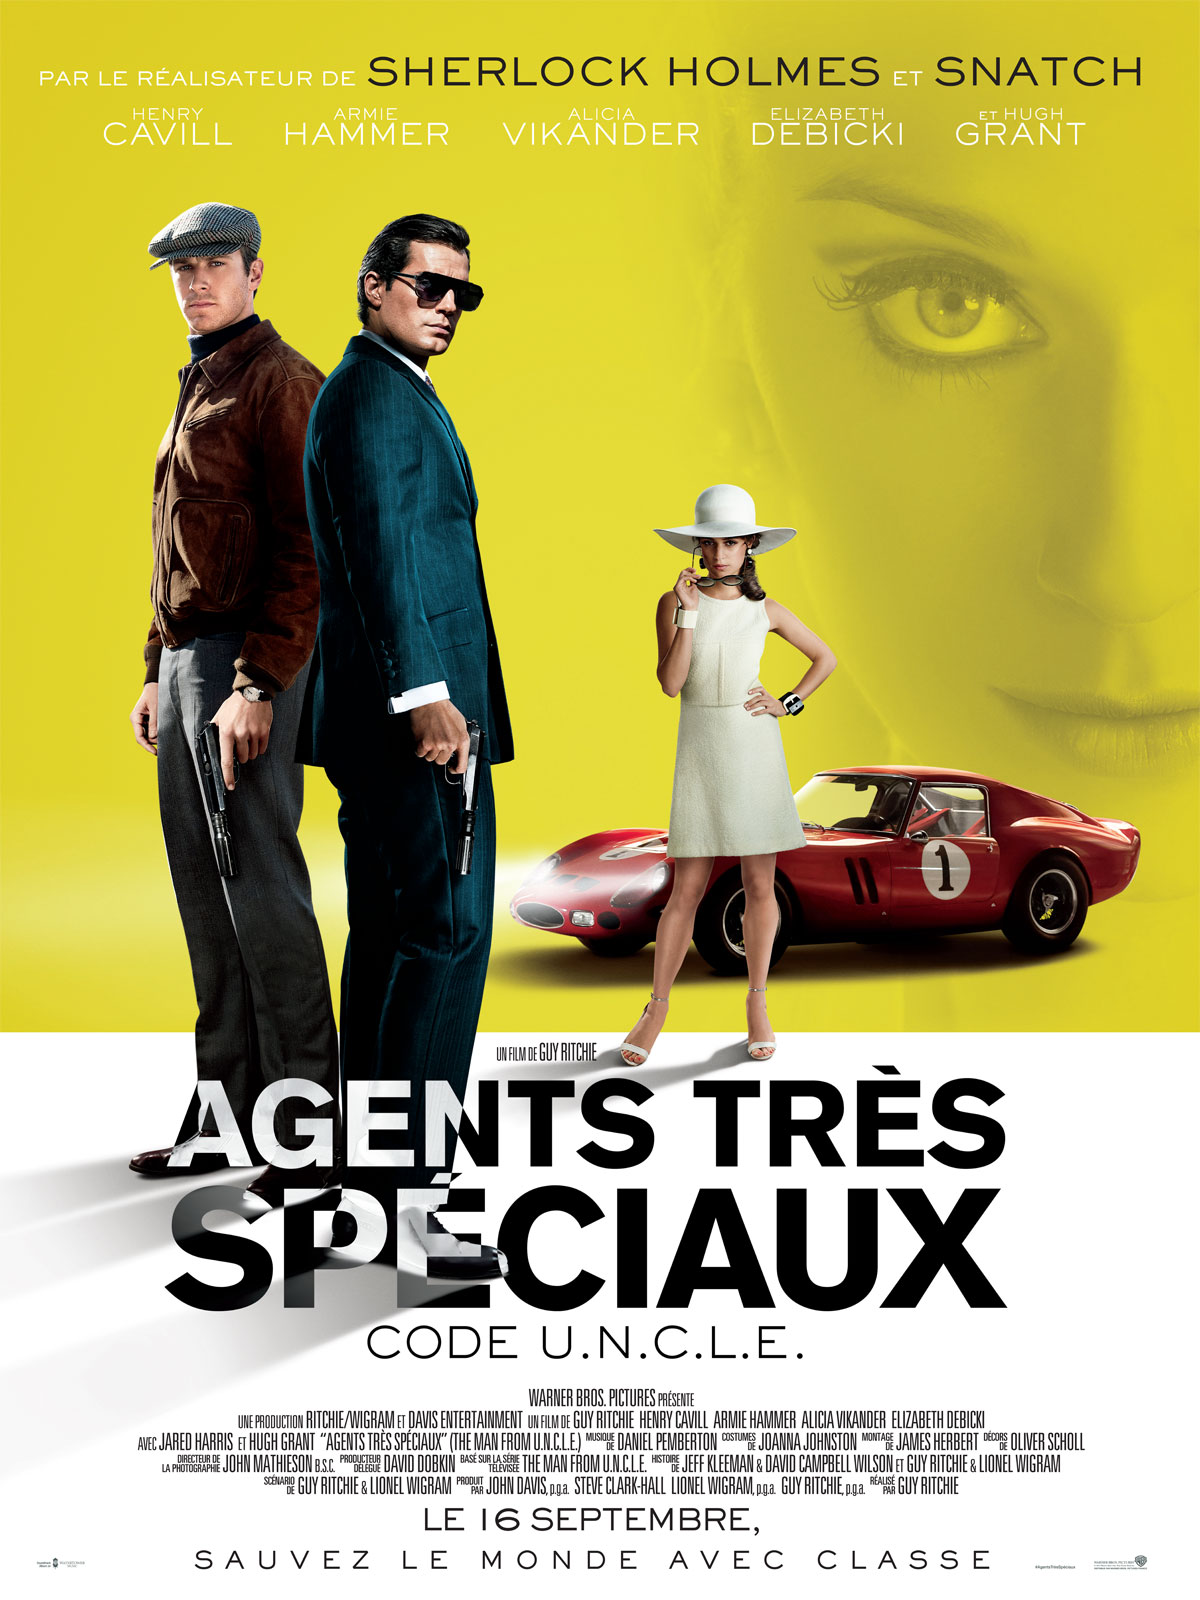 Agents très spéciaux - Code U.N.C.L.E_affiche